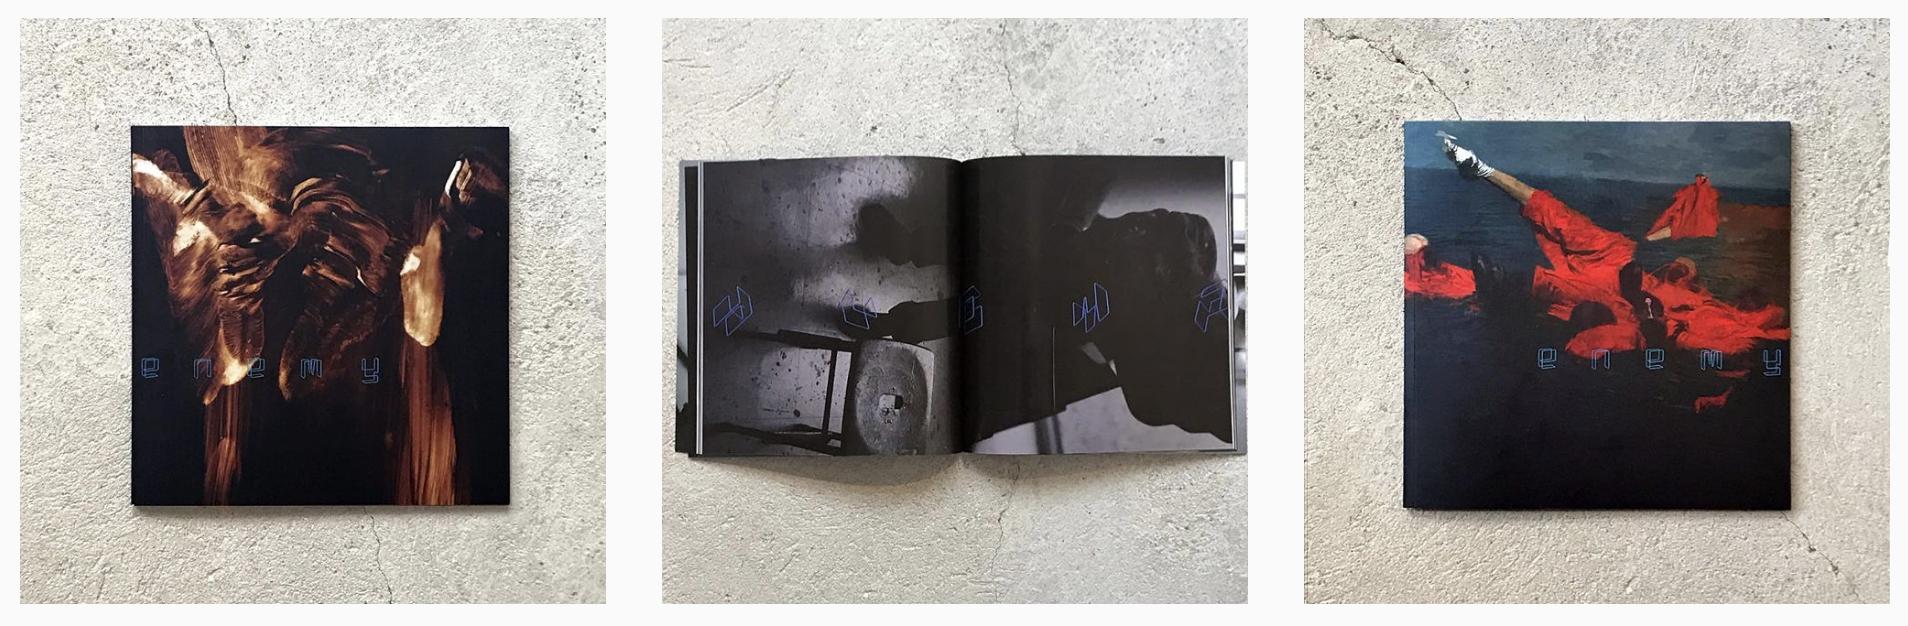 Enemy Catalogue Jim Threapleton Phil Hale No 20